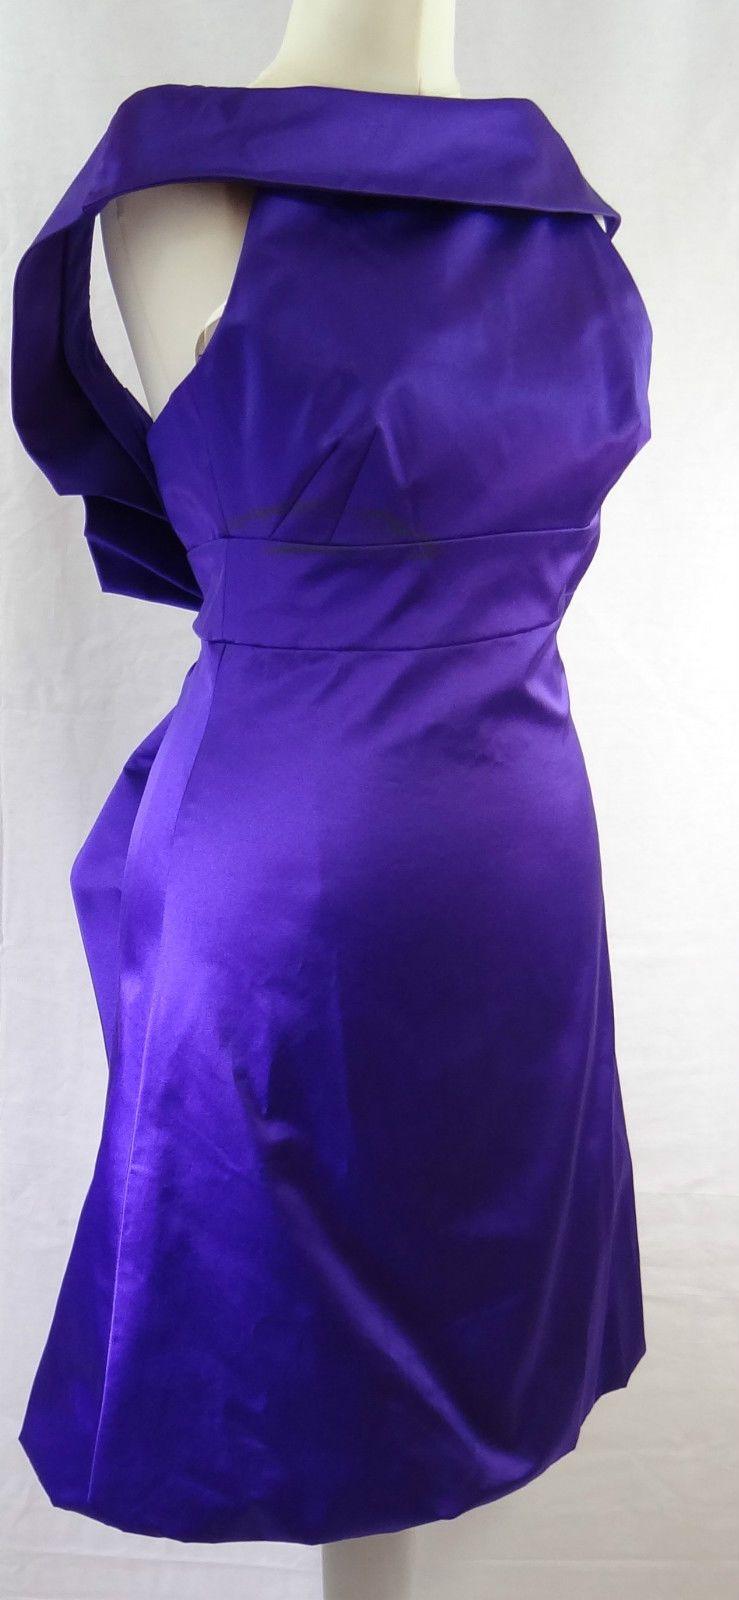 Karen Millen purple satin dress size 6 | eBay | para coser ...